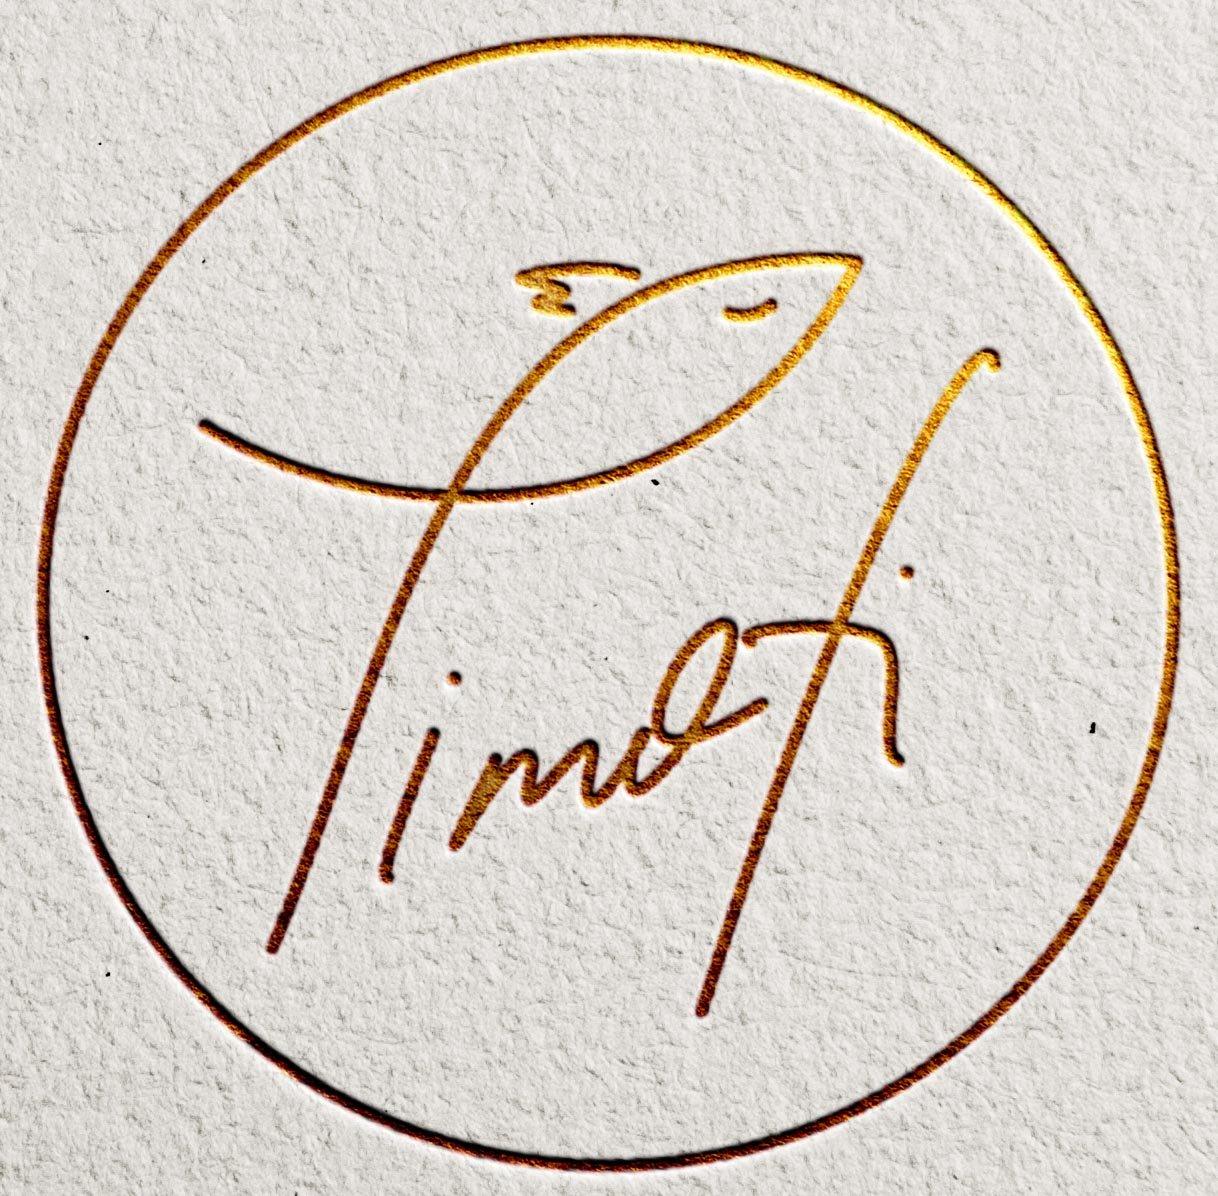 30402-logo.jpg